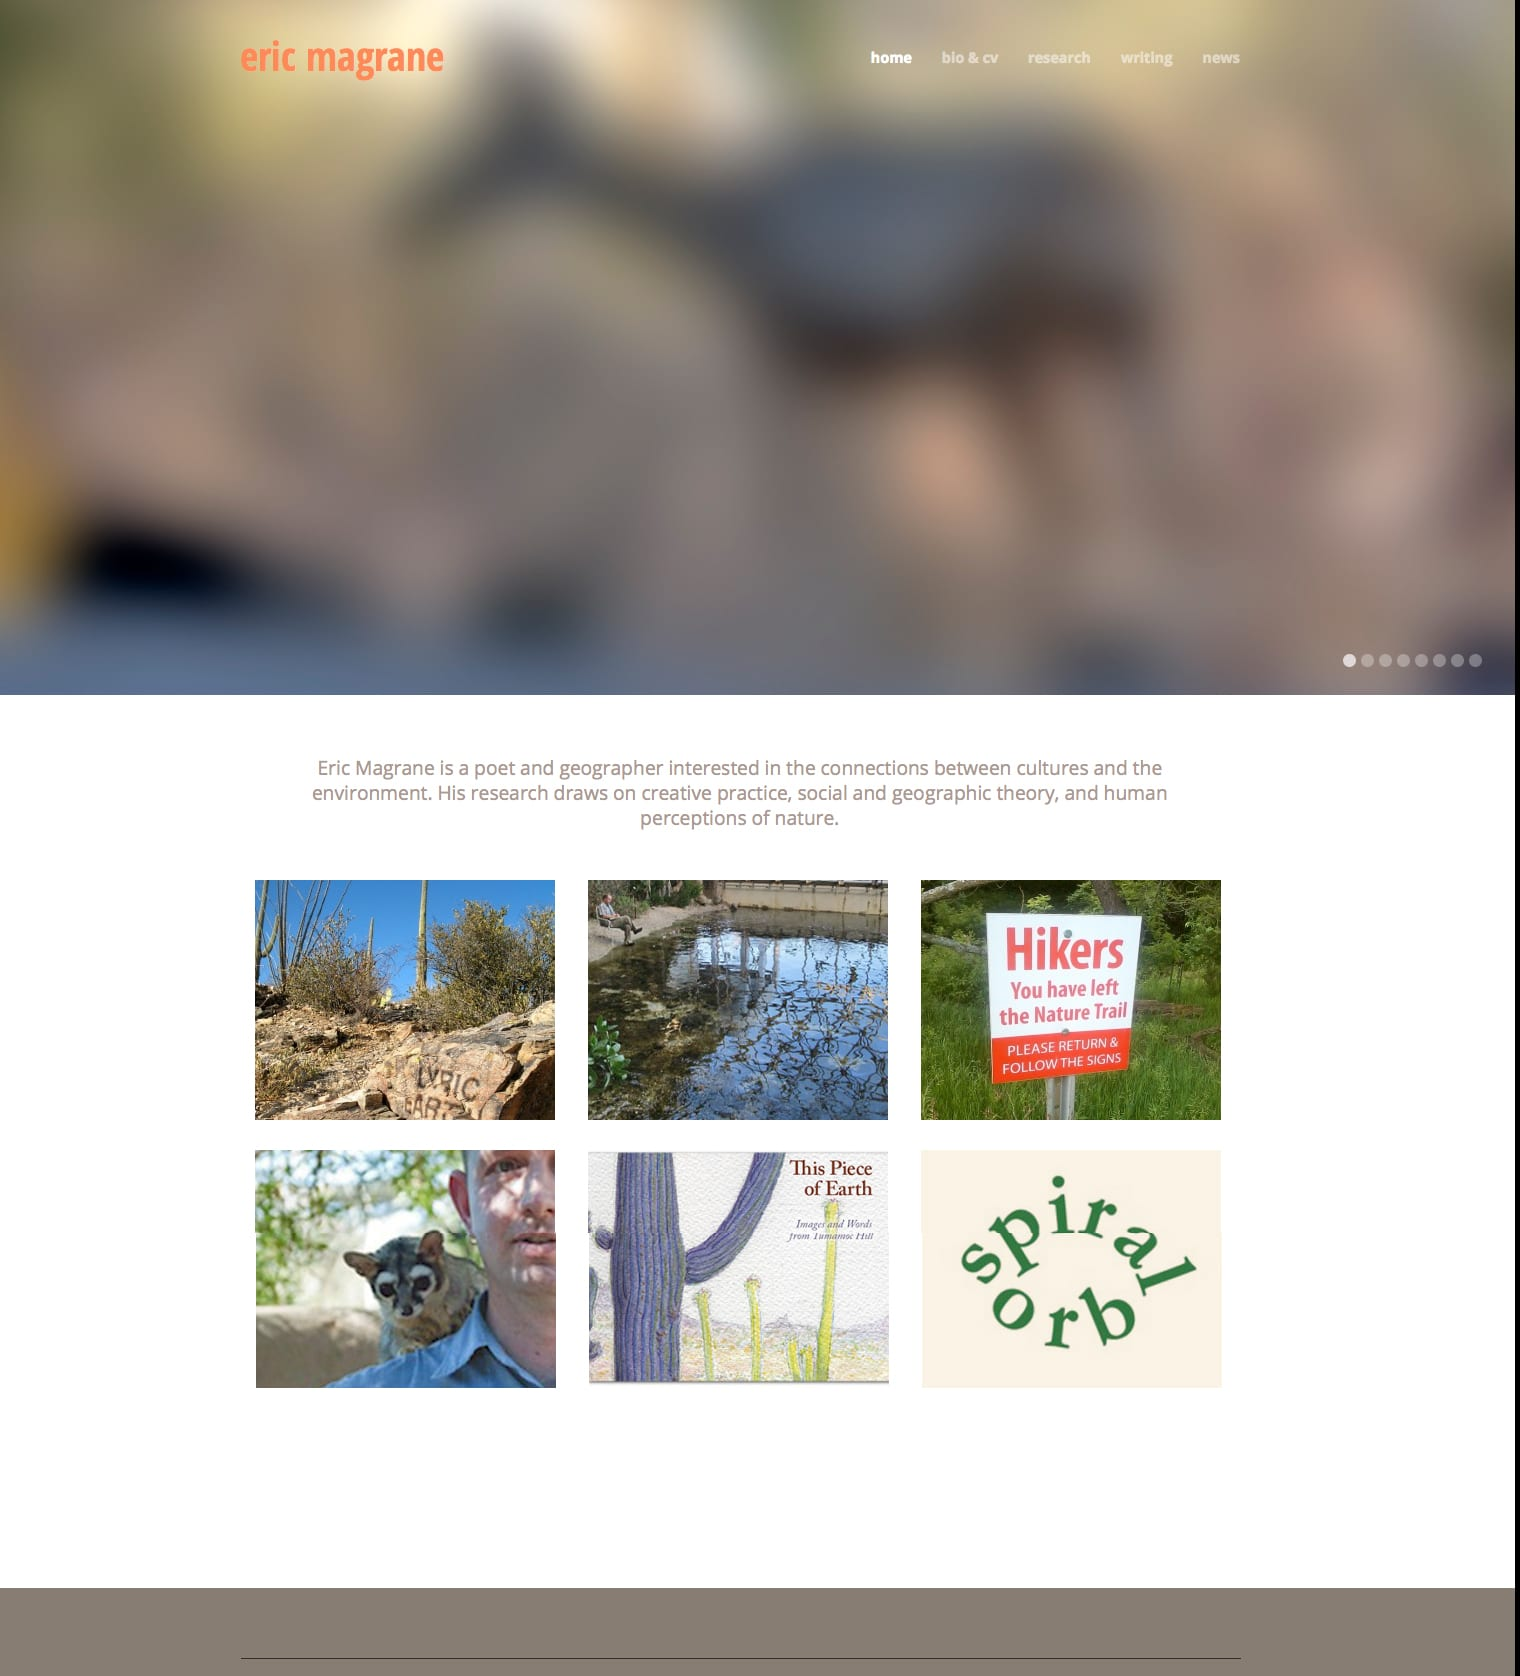 ericmagrane.com home page